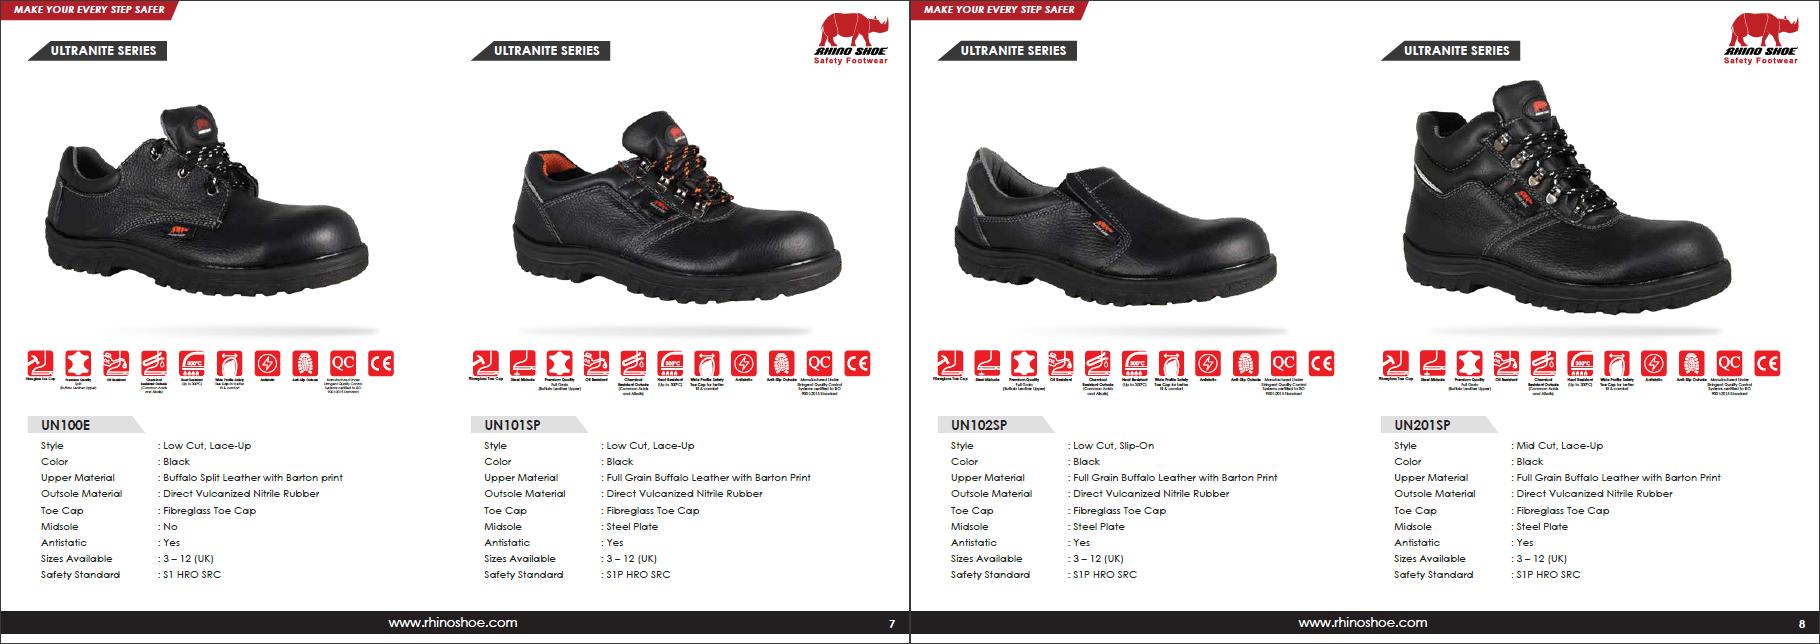 Shoe catalogs - A list of real catalogs